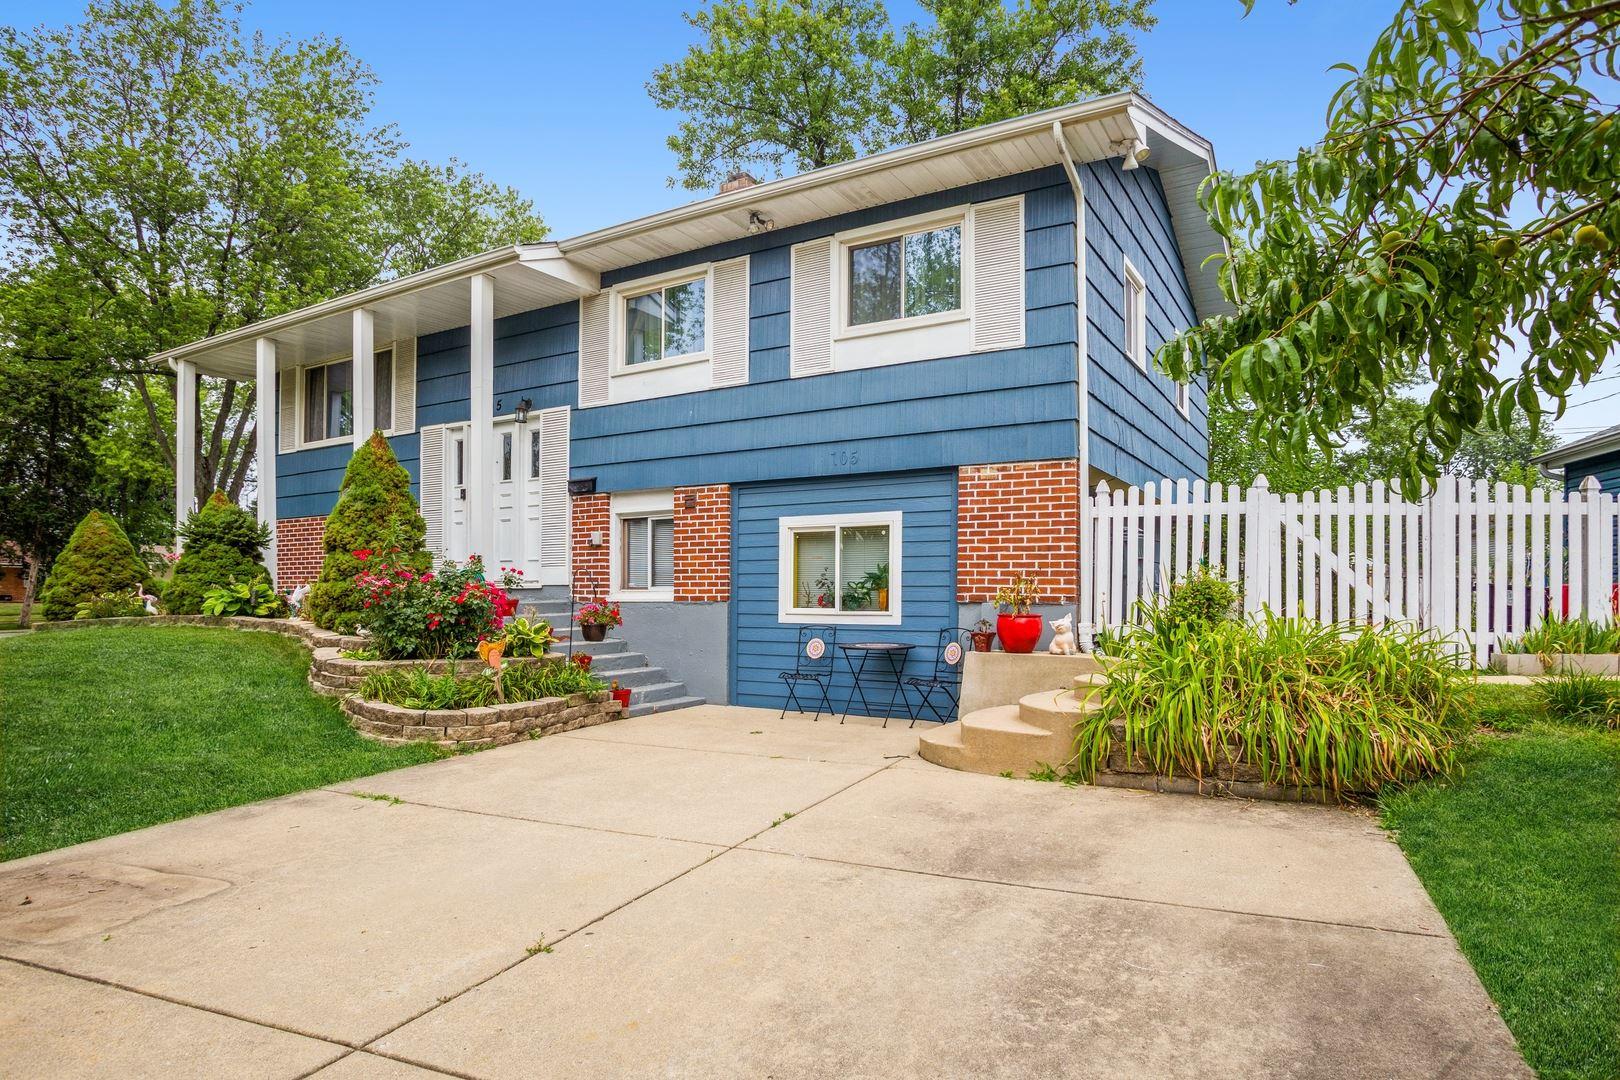 705 Audubon Street, Hoffman Estates, IL 60169 - MLS#: 11255883